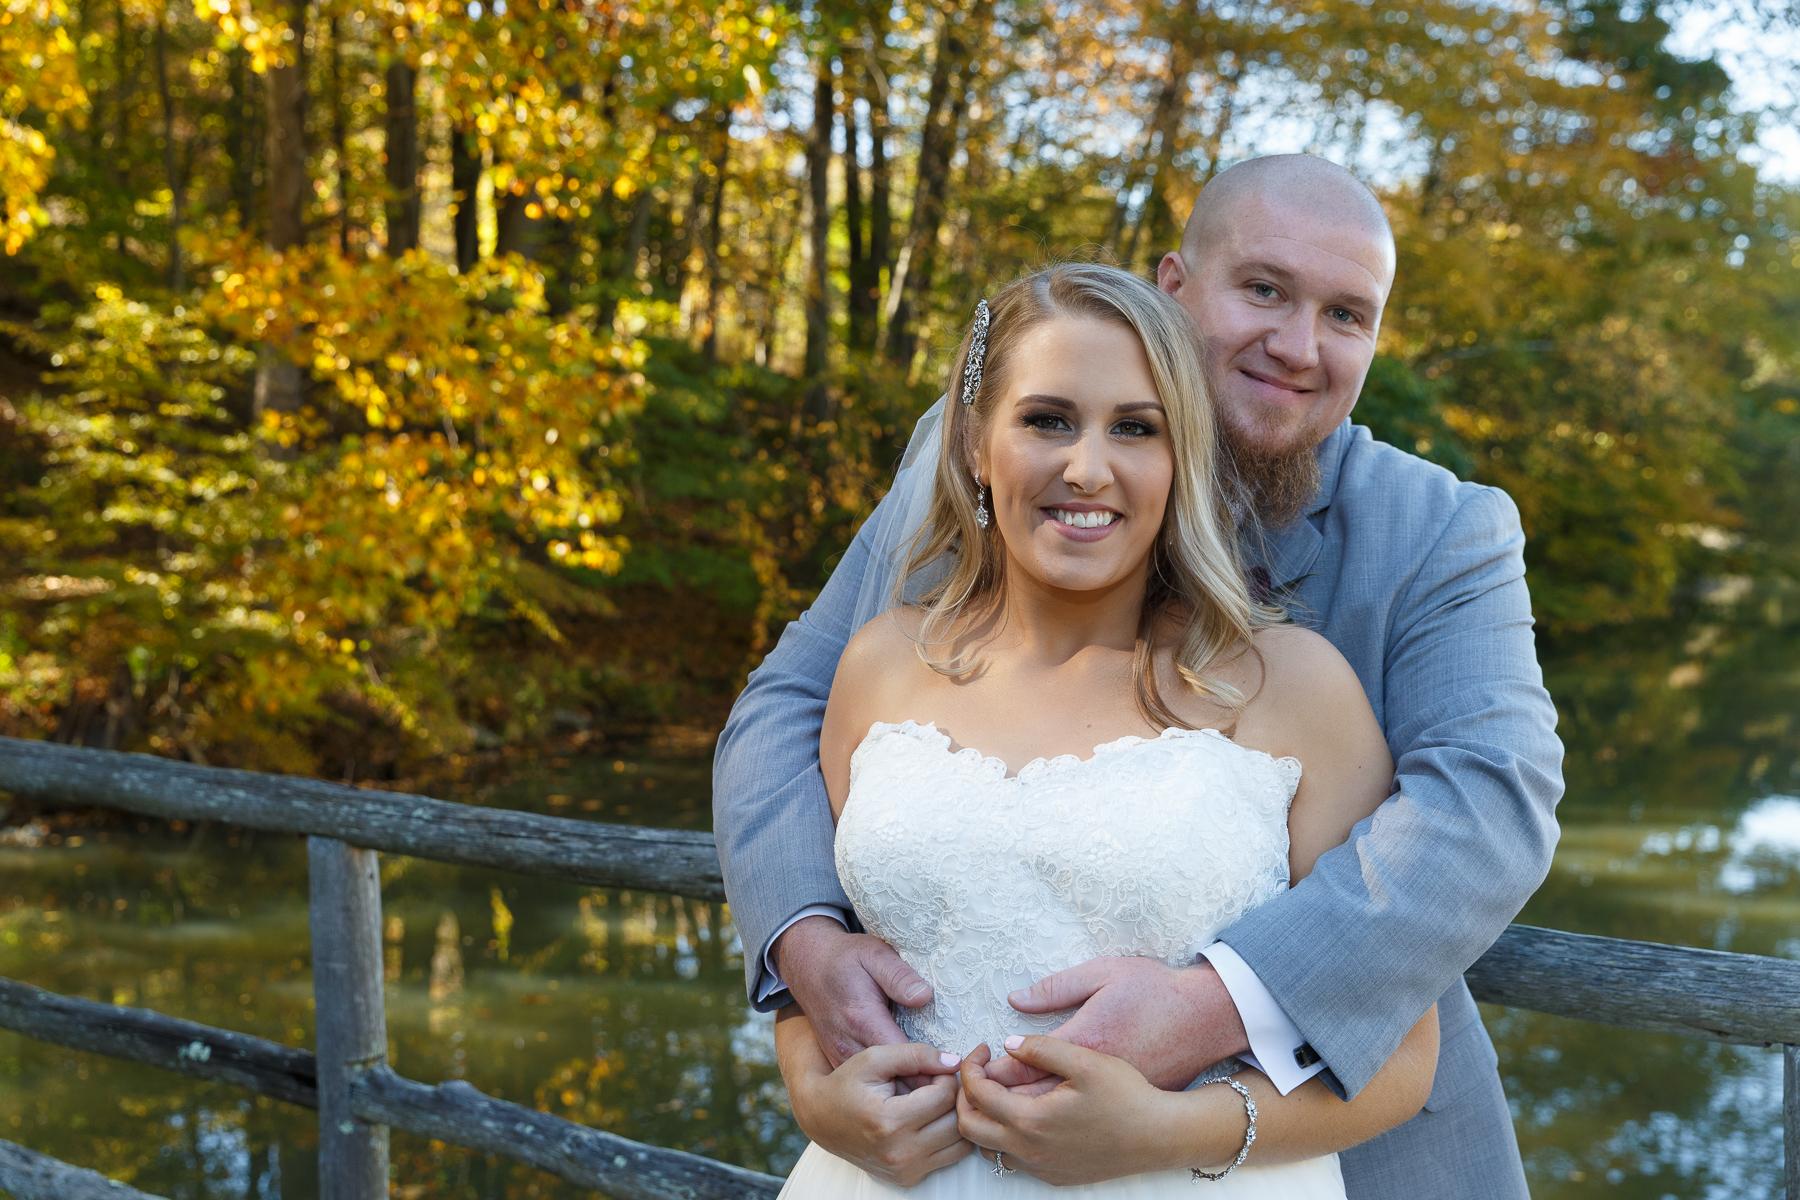 Caitlin and Brandon Wedding_  Jonathan Heisler  _ _ 10152016 _ 380.jpg